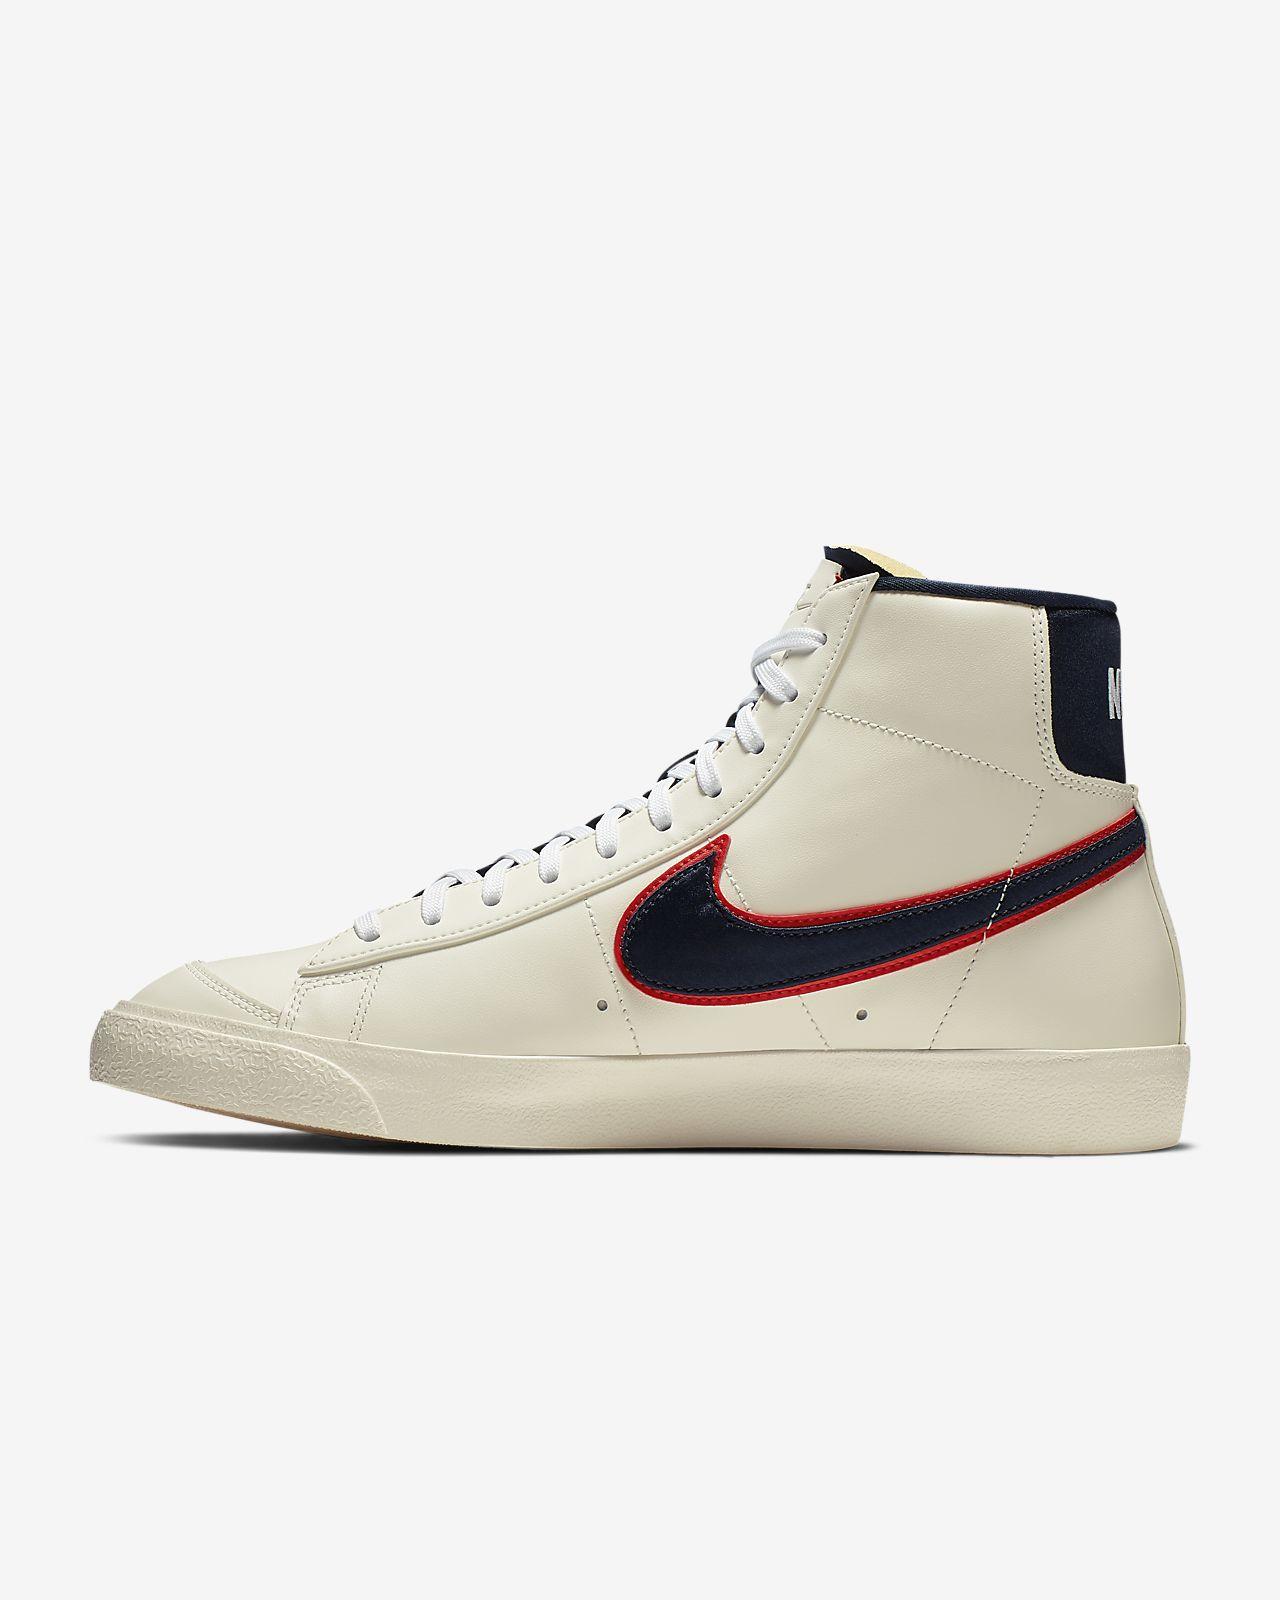 Nike Blazer Mid '77 Vintage QS Men's Shoe